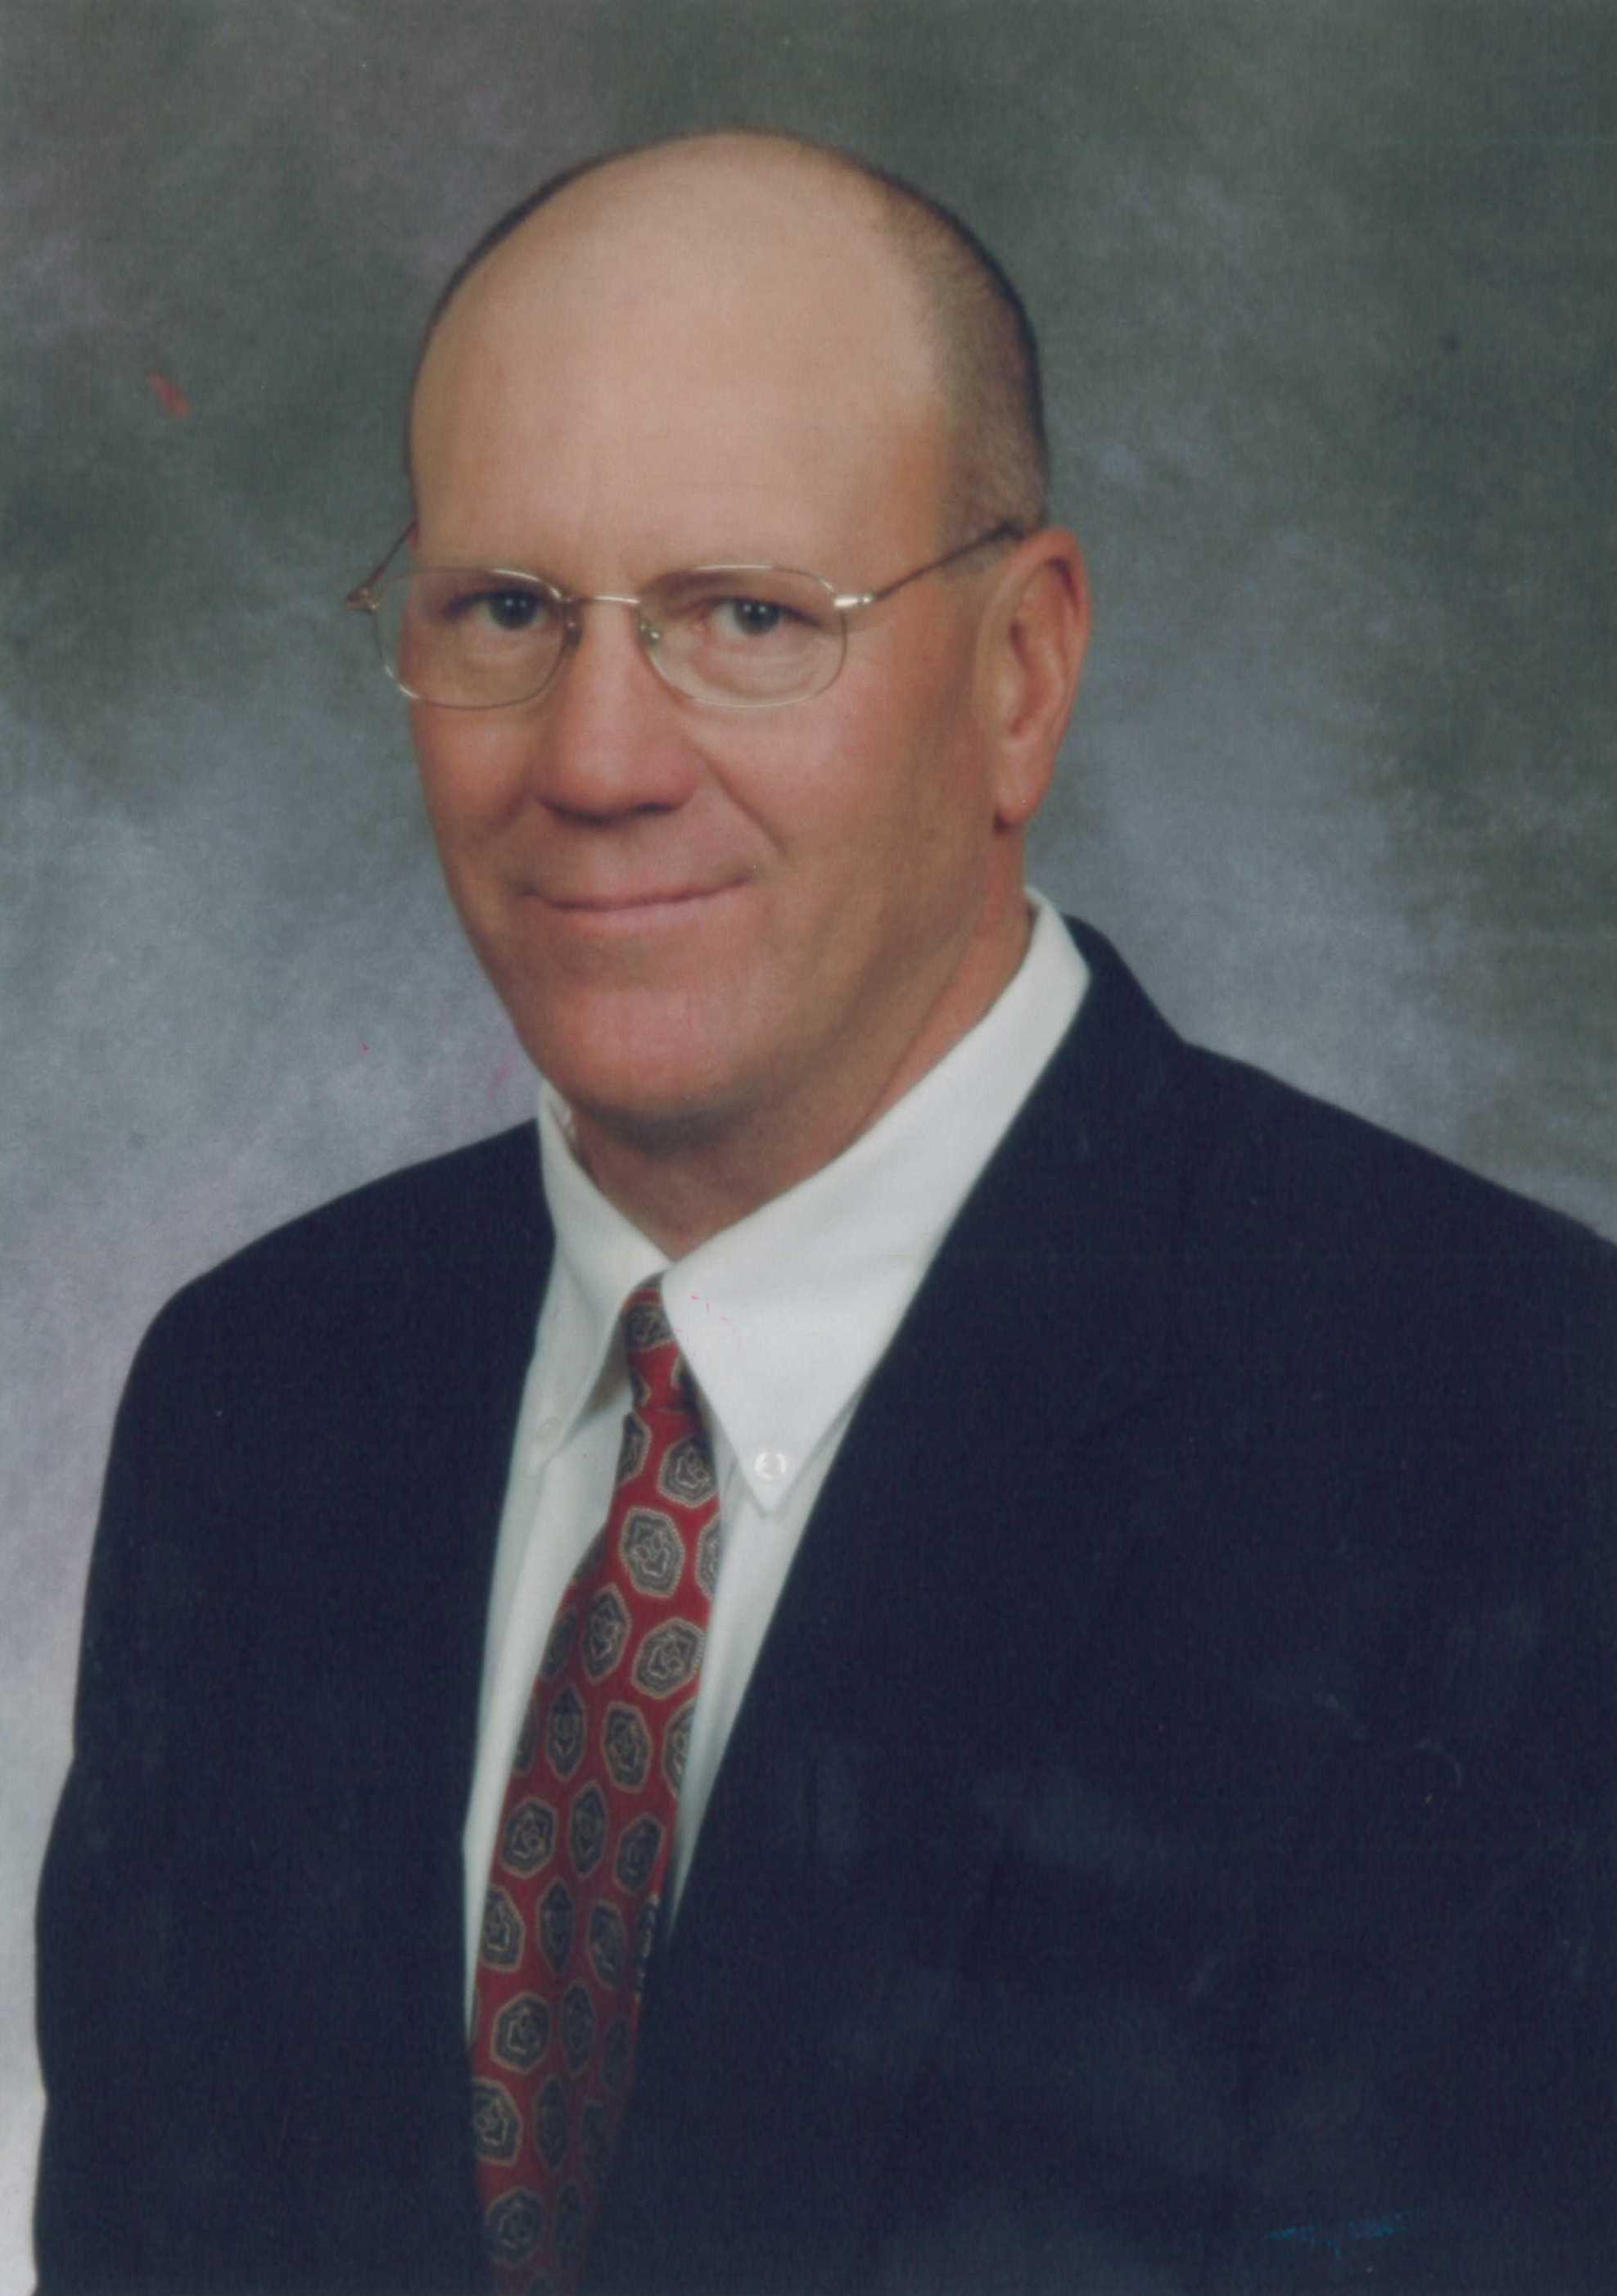 Jim Stuever